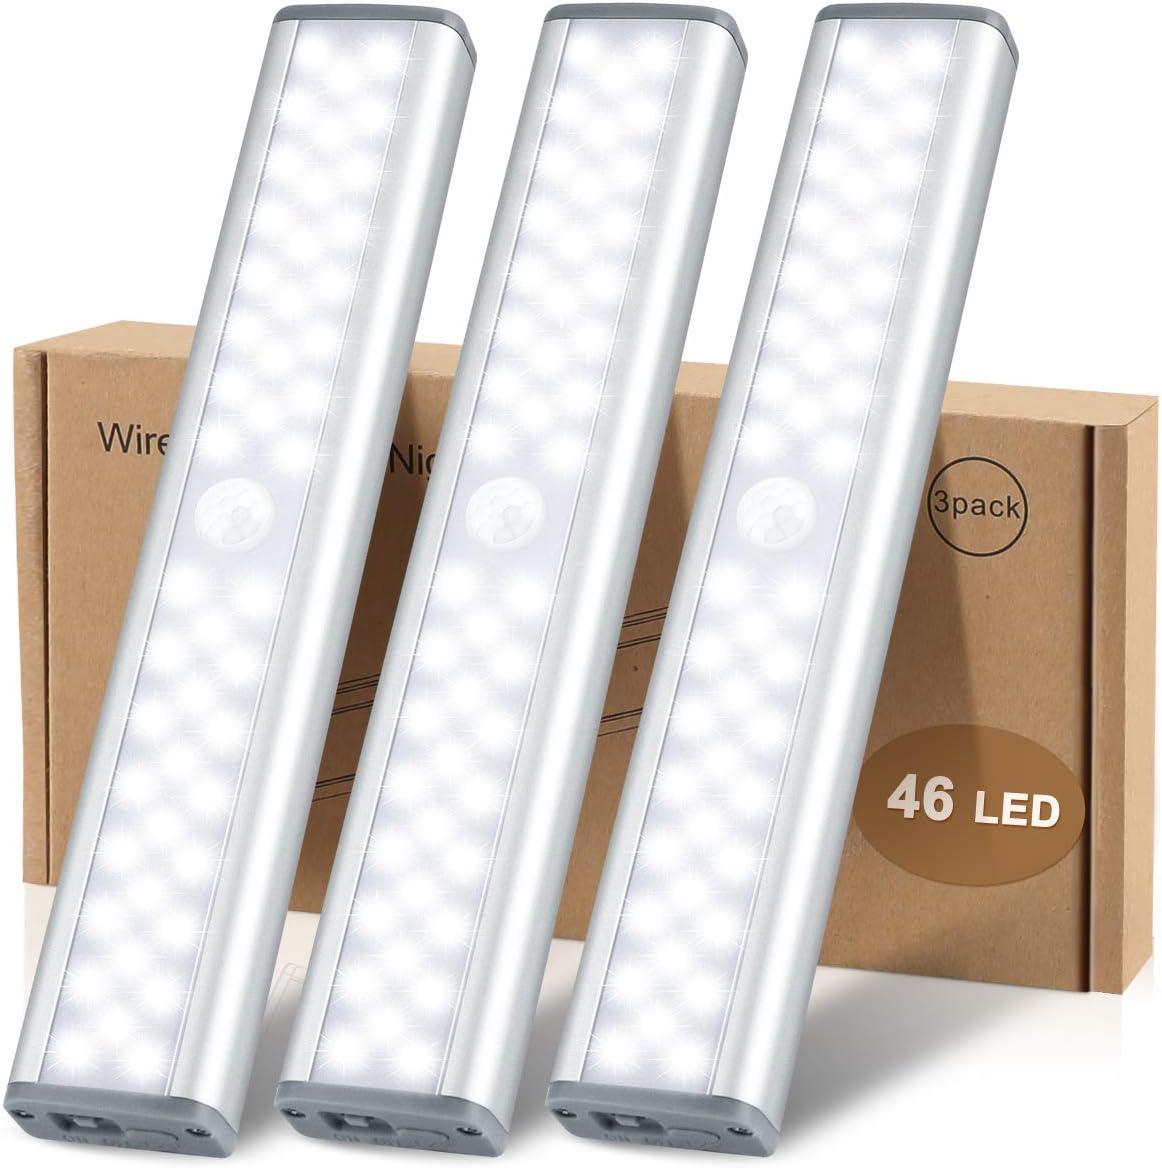 McGor [46 LED] rechargeable motion sensor closet Light: Best Value for money